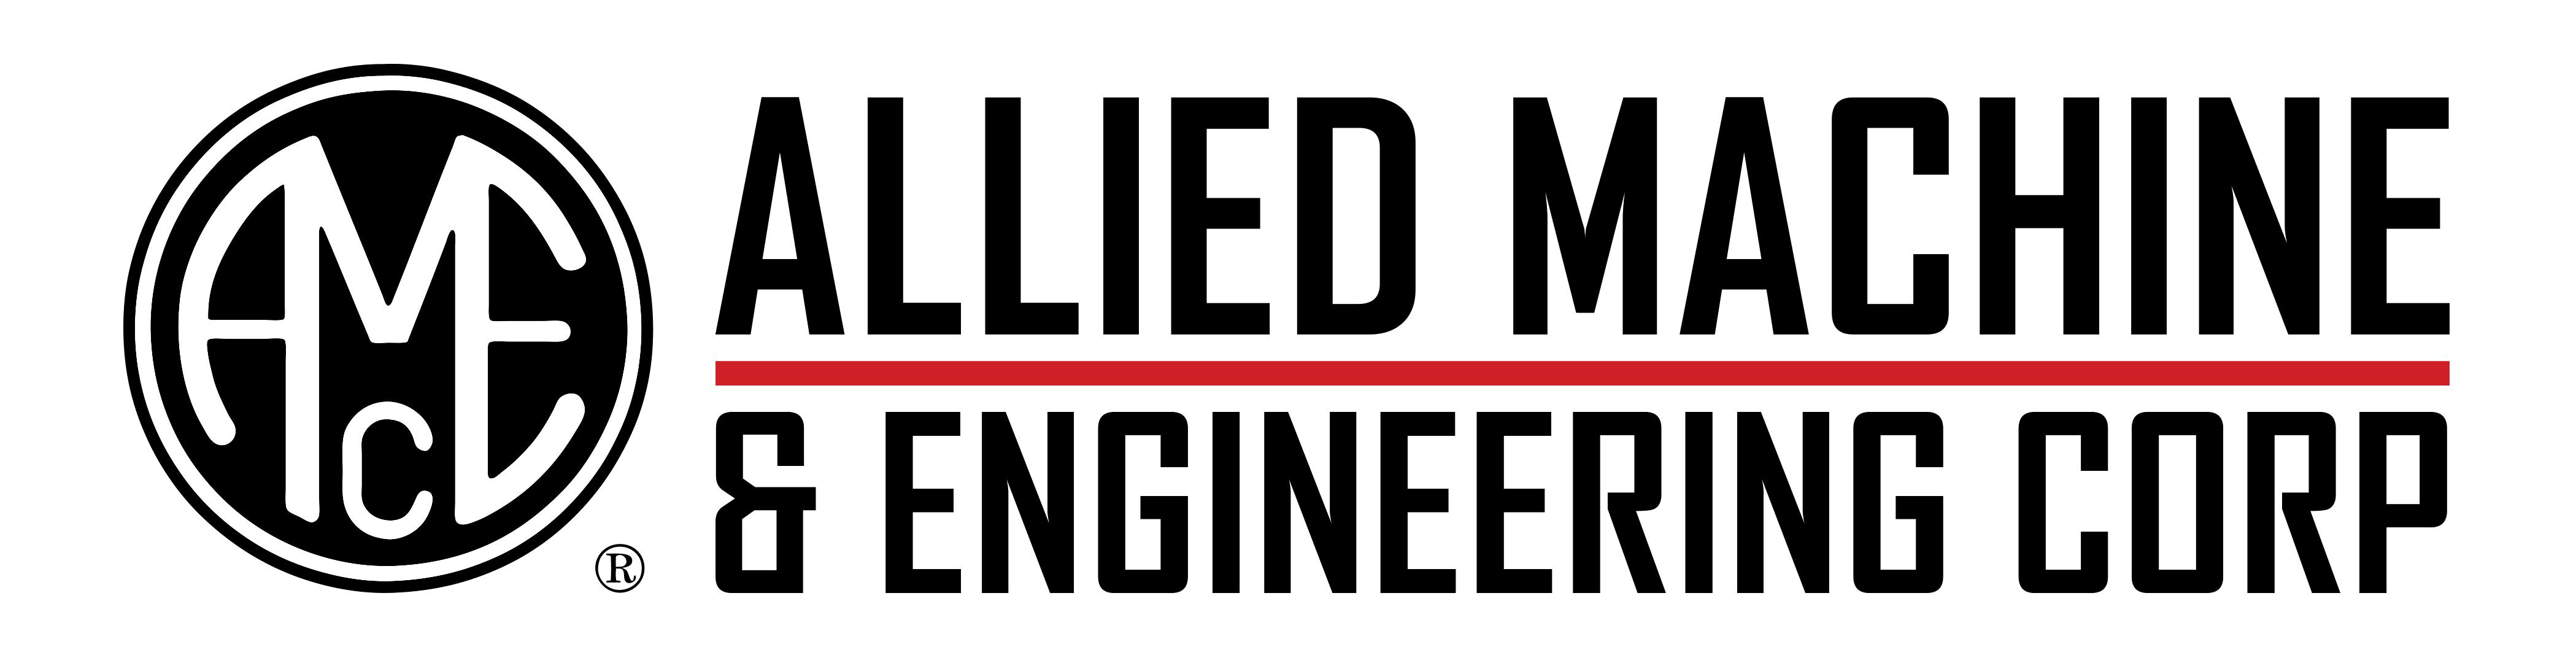 Visit Allied Machine & Engineering Corporation's website